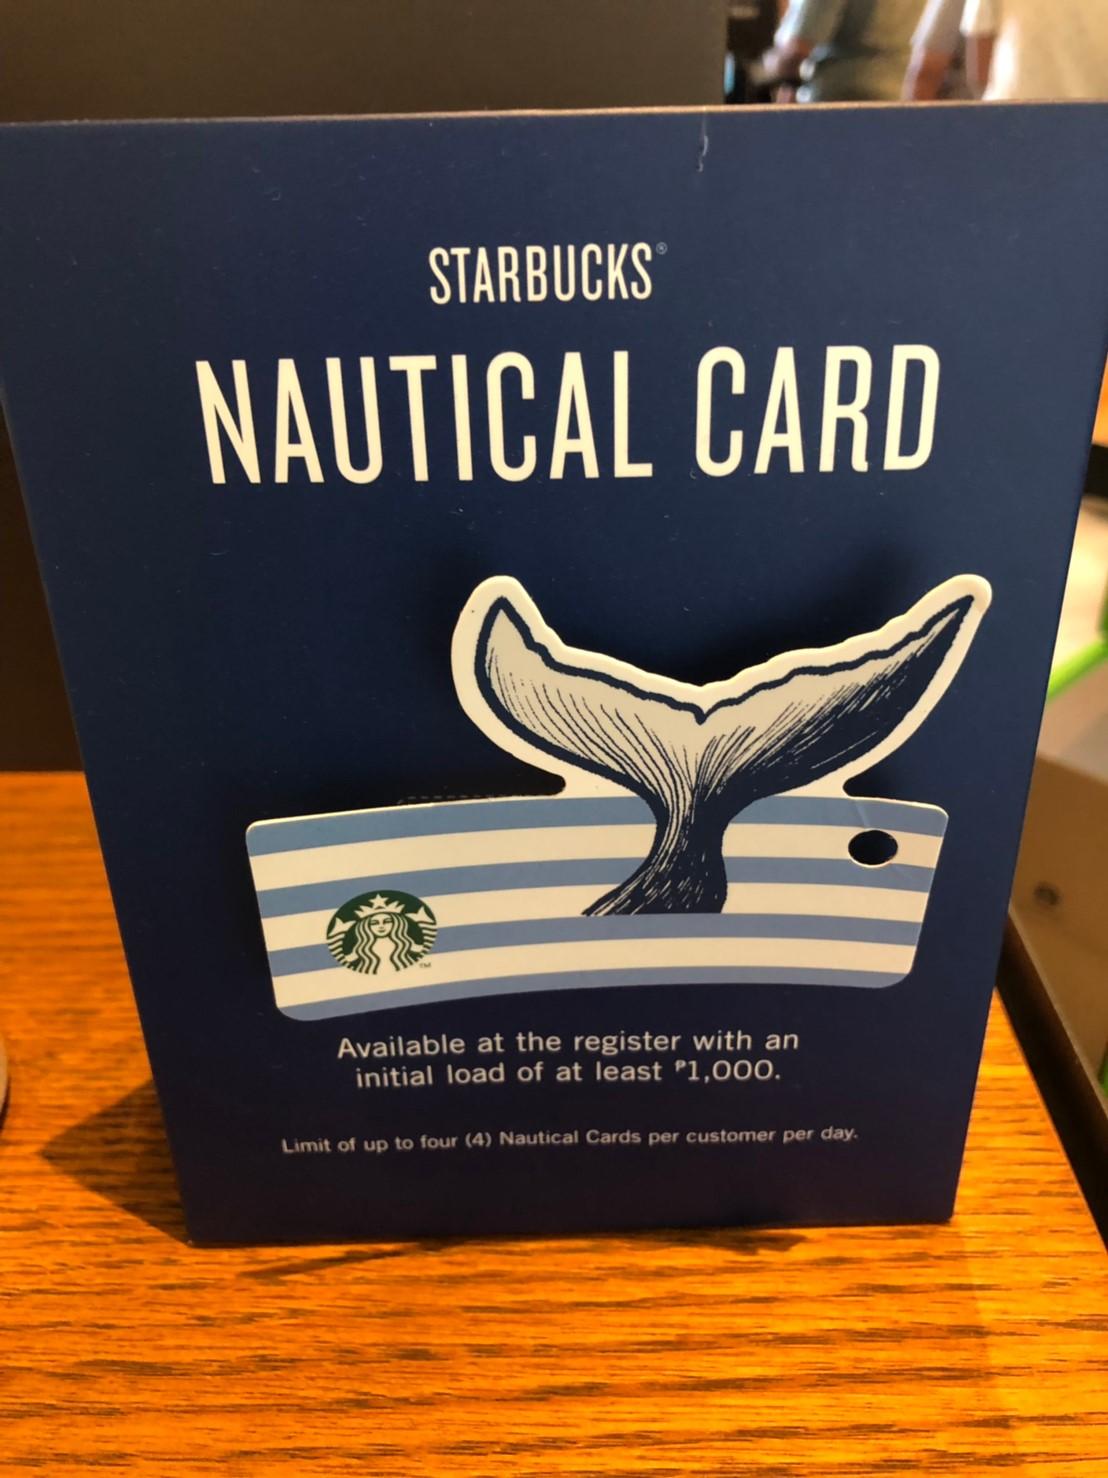 "Cebu_Starbucks_SBcard_024"""""